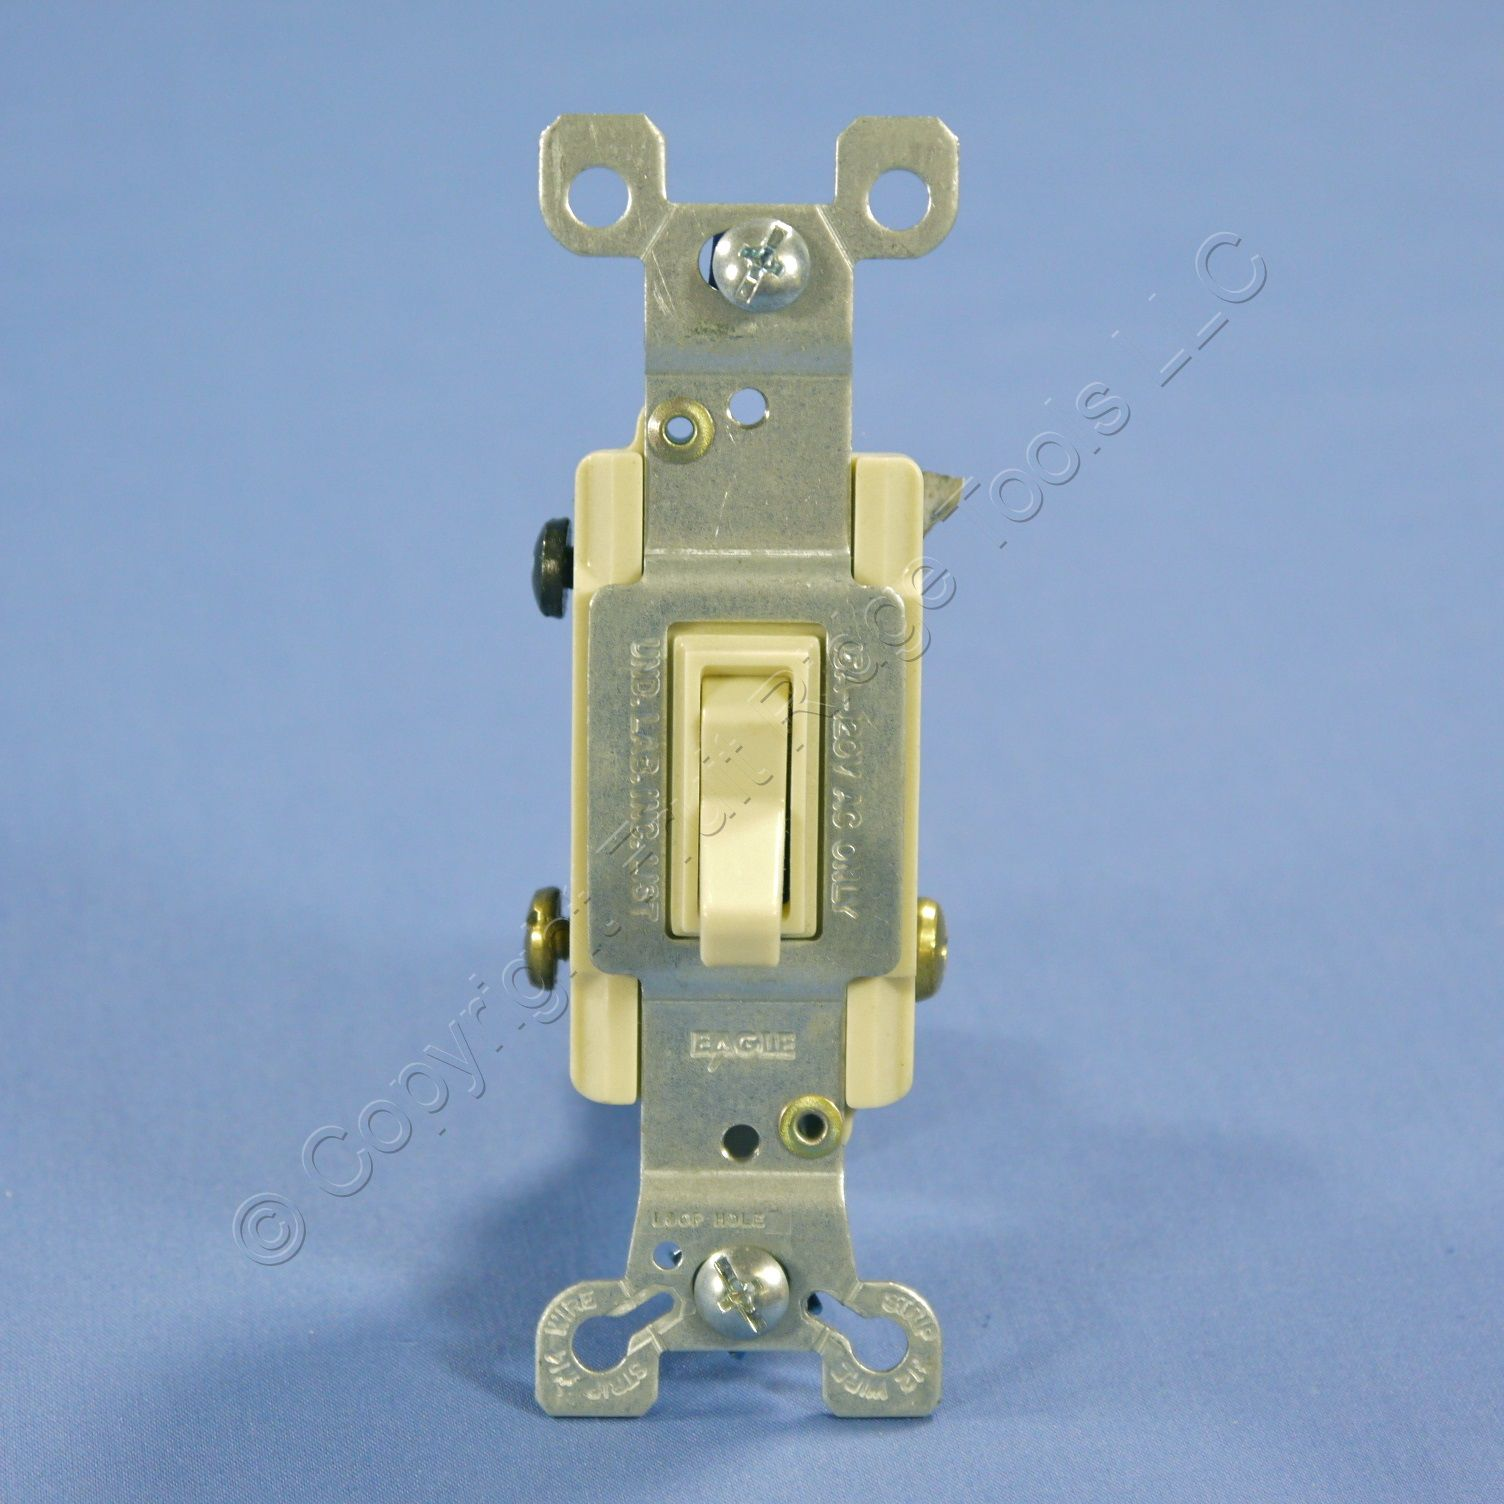 Shop Eagle Electric Ivory Toggle Wall Light Switch 3 Way Quiet Brass 15a 120v Bulk 1303 7v Fruit Ridge Tools